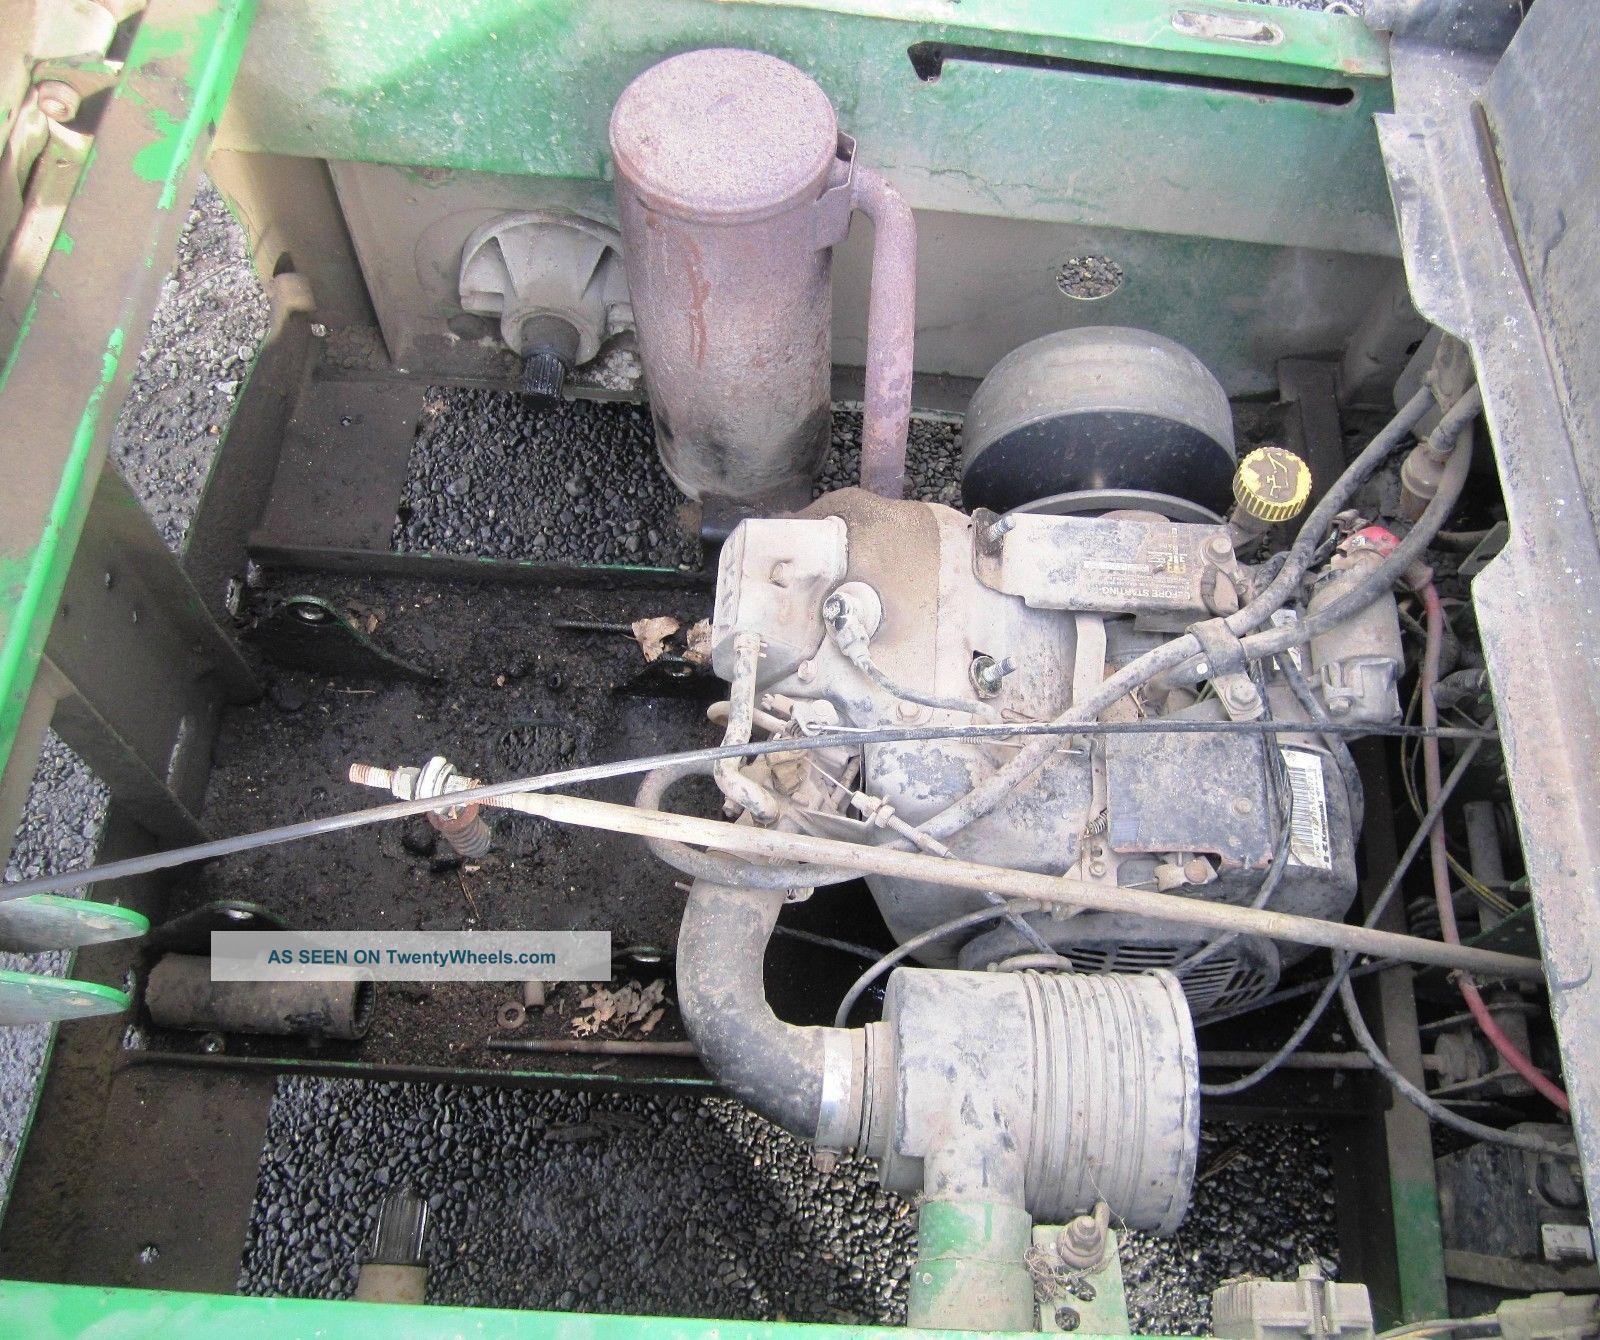 John Deere 4x2 Gator Utility Vehicle - Gas - - Parts Only ...